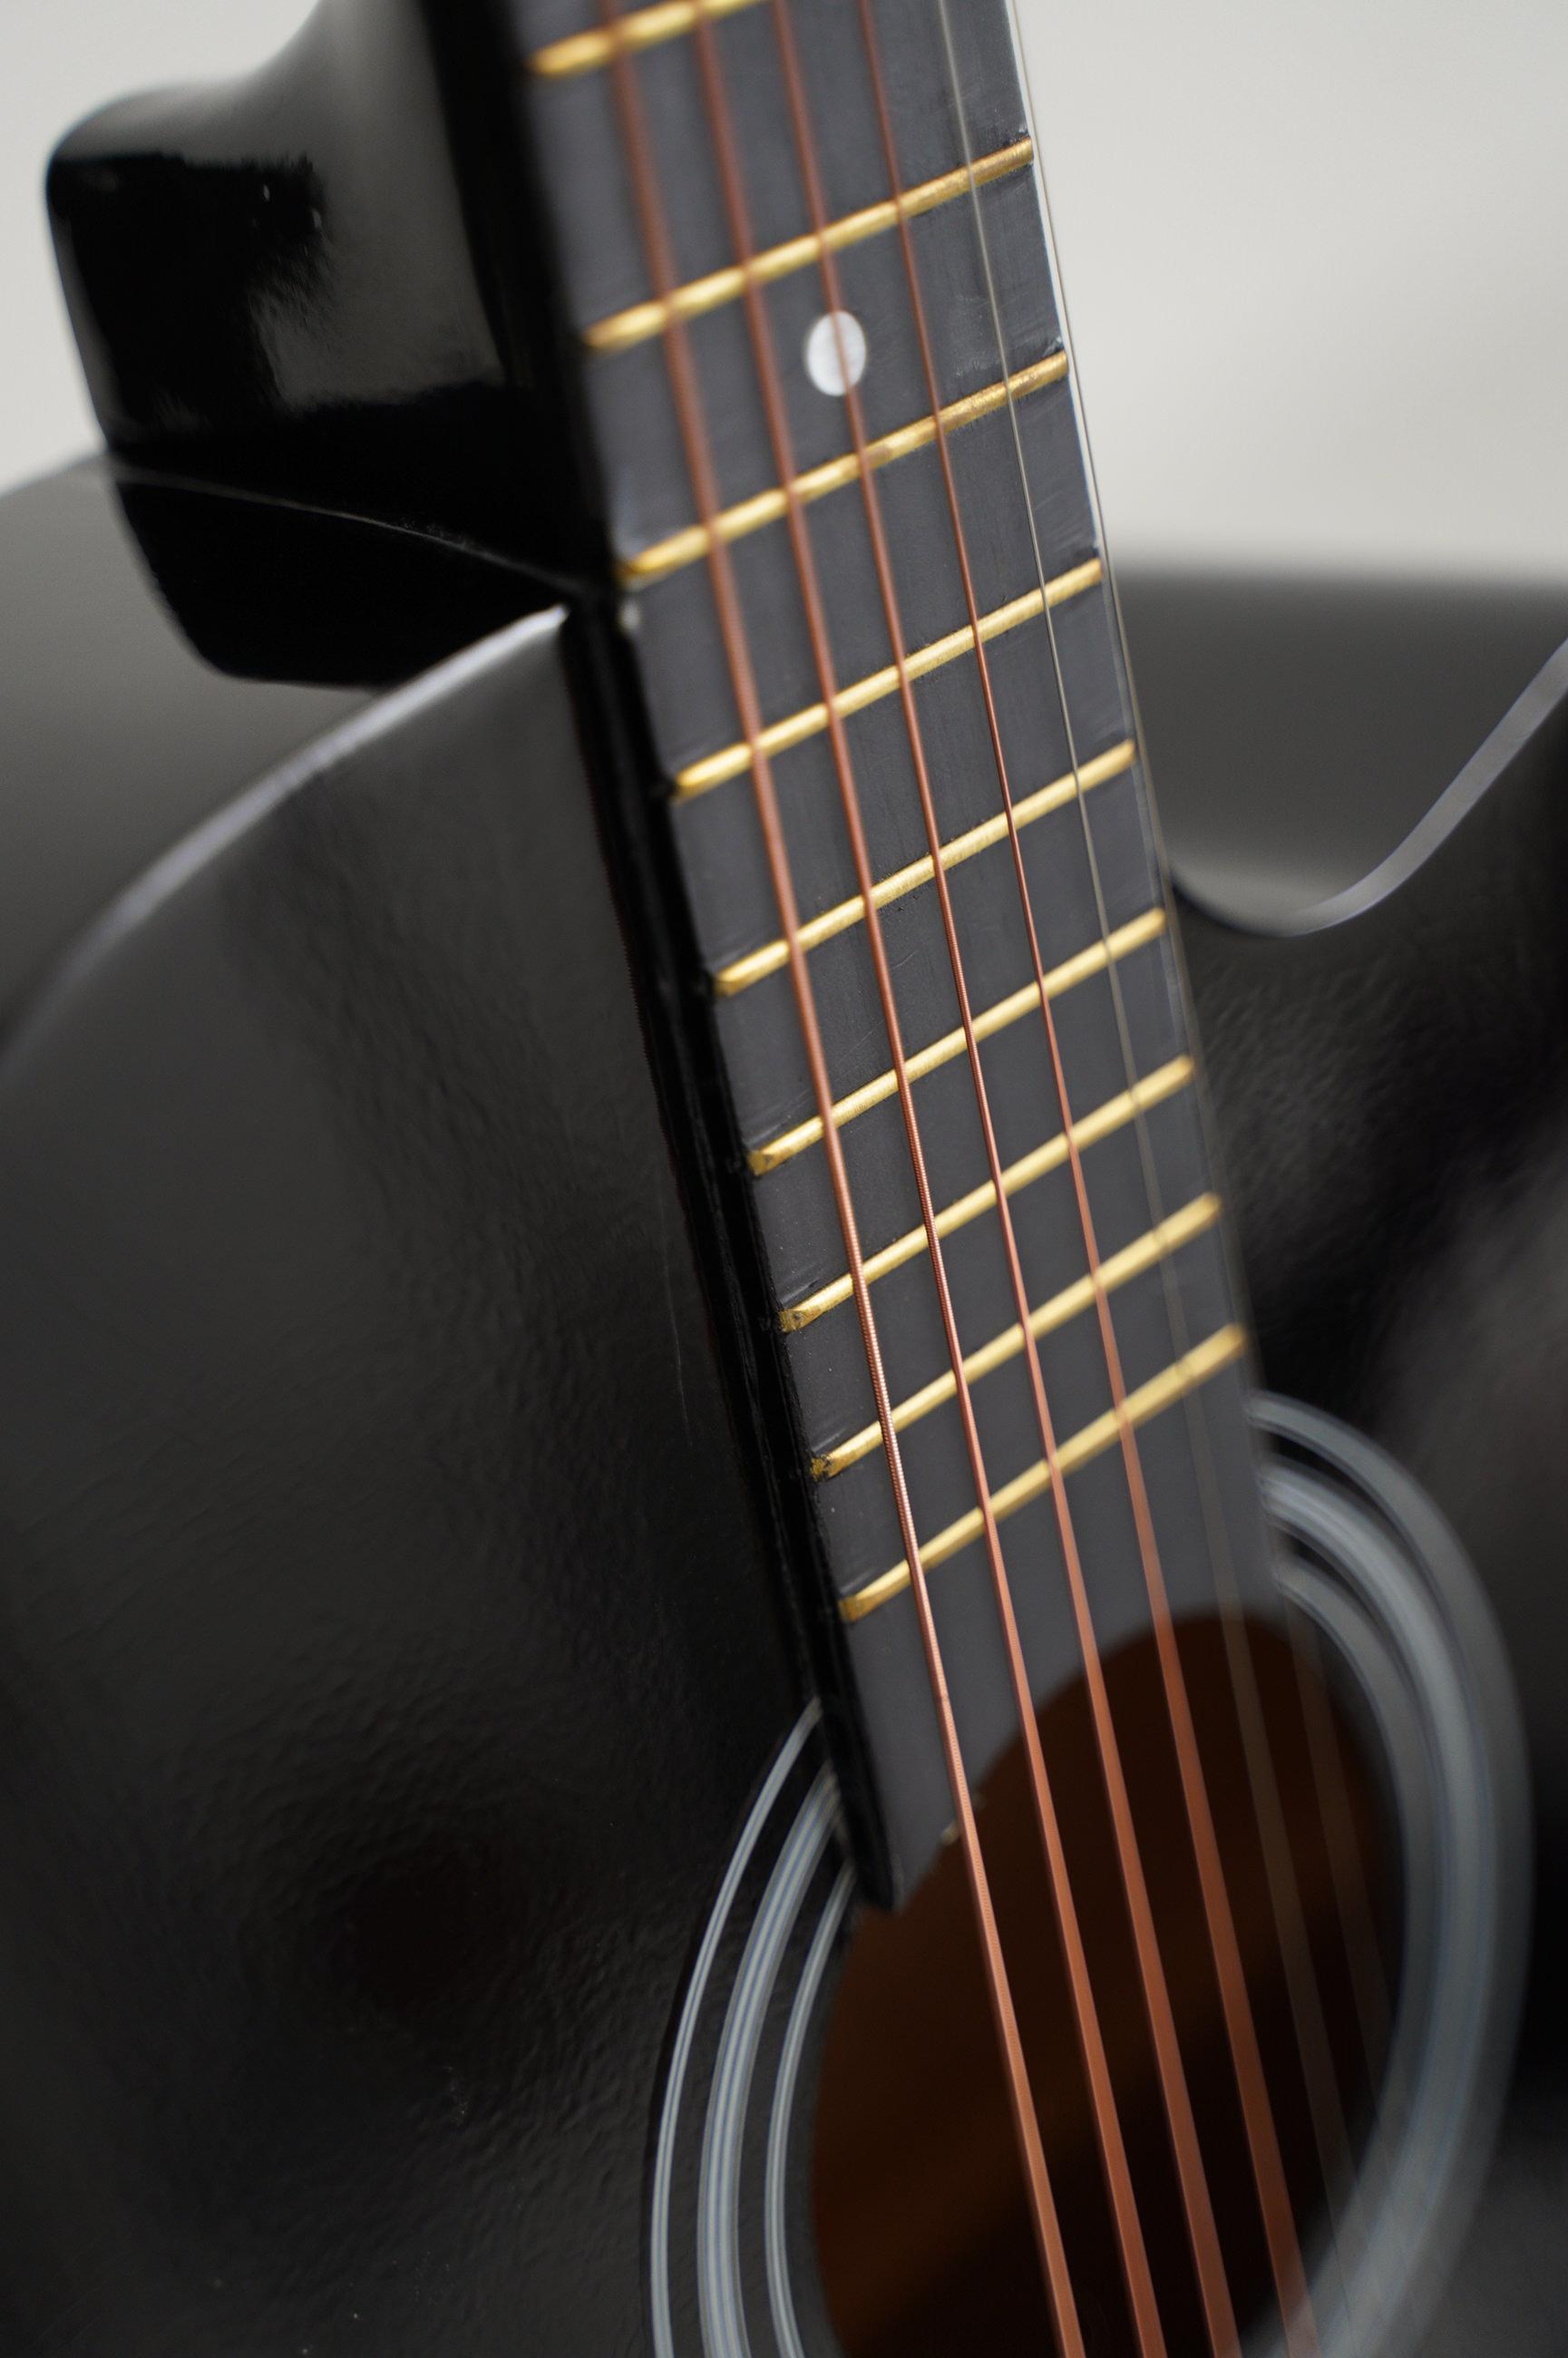 moly-ag-38-bk-acoustic-guitar-singapore-5.jpg